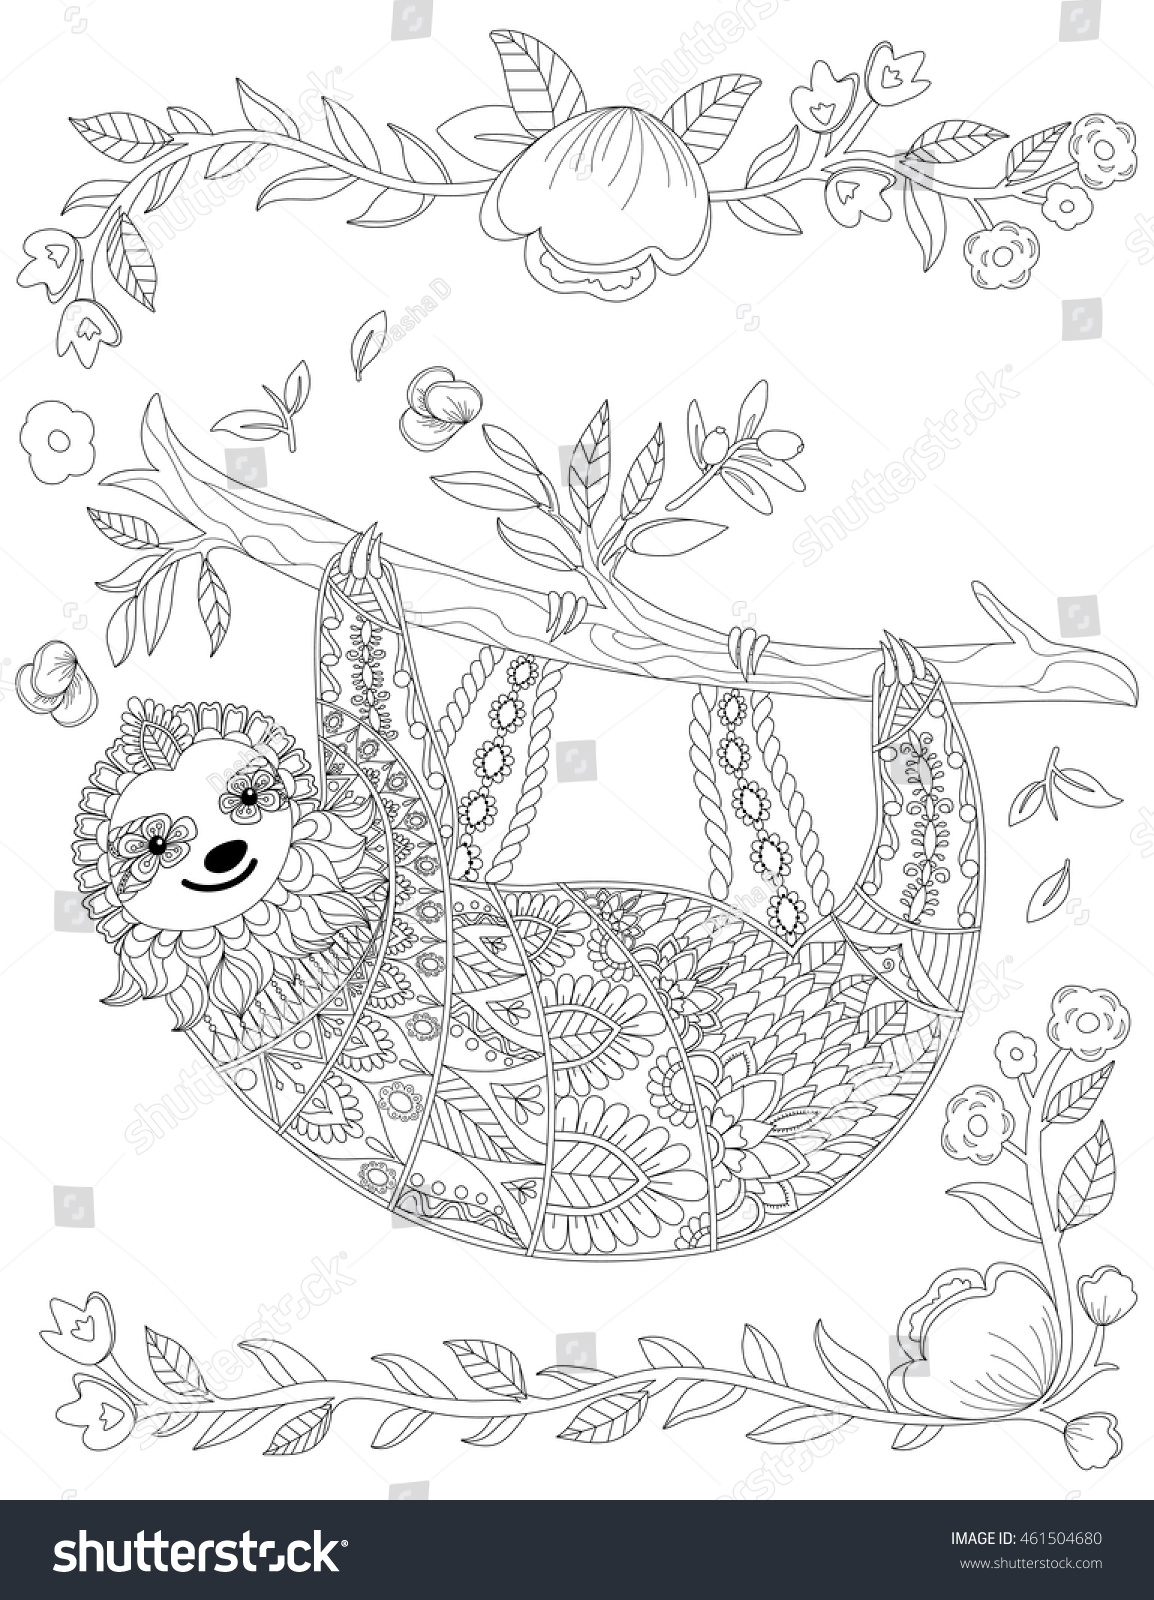 vector ornate cute sloth on tree stock vector 461504680 shutterstock